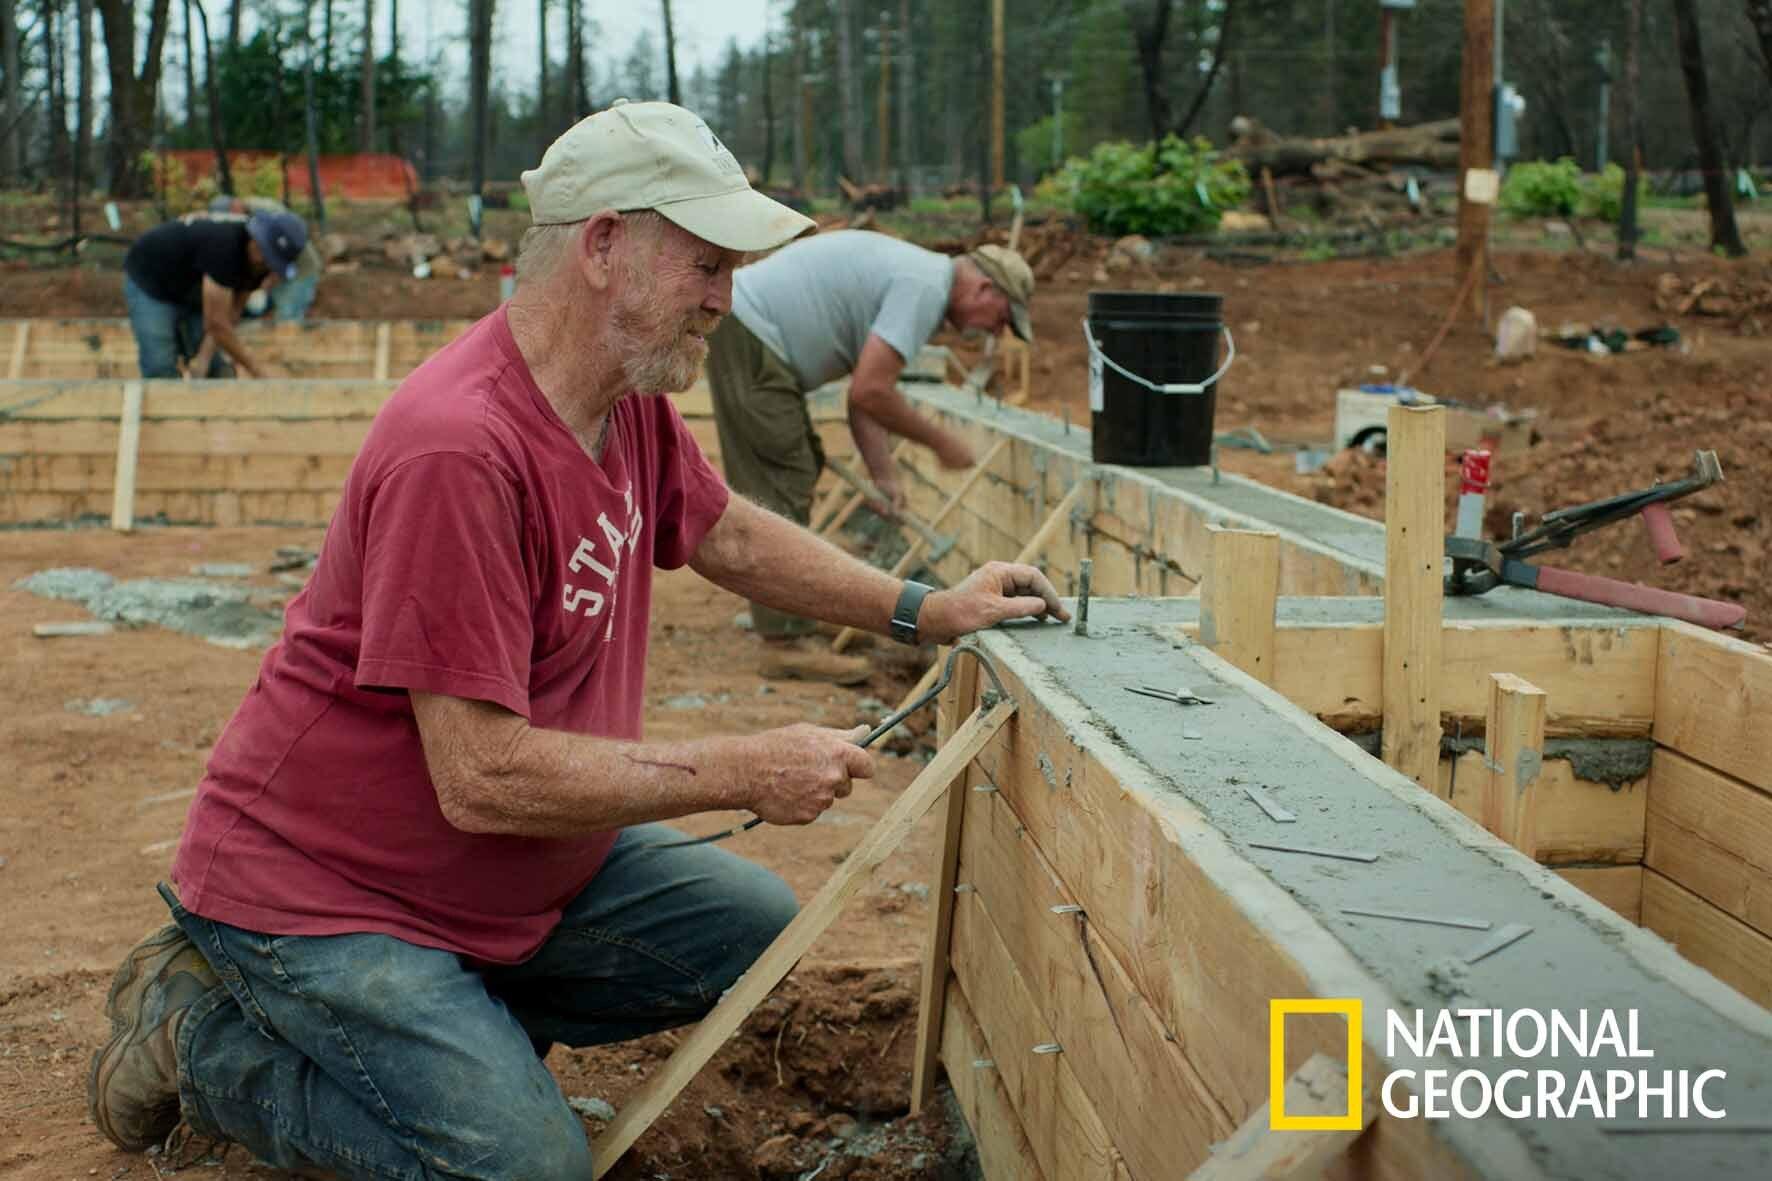 Rebuilding Paradise: Ντοκιμαντέρ του βραβευμένου Ρον Χάουαρντ